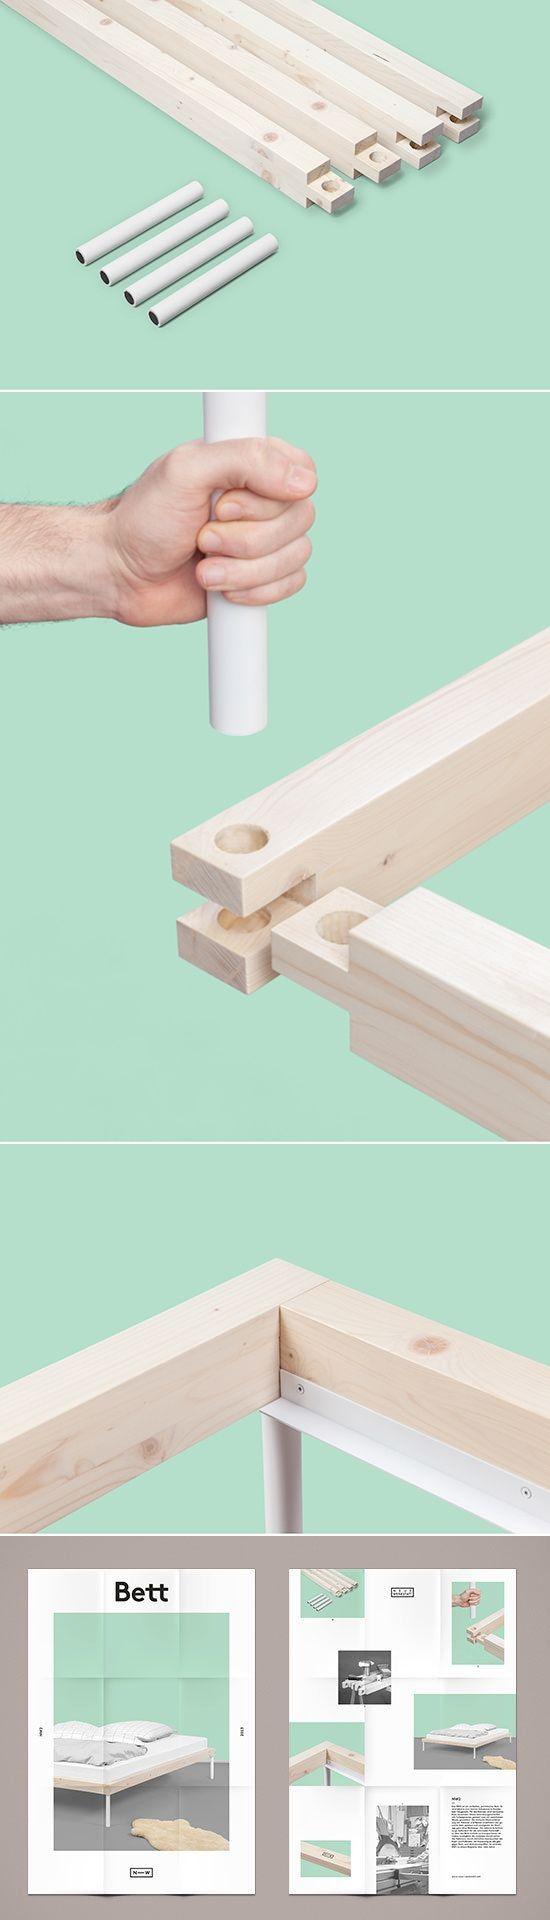 Best 25 Modular Furniture Ideas On Pinterest Modular